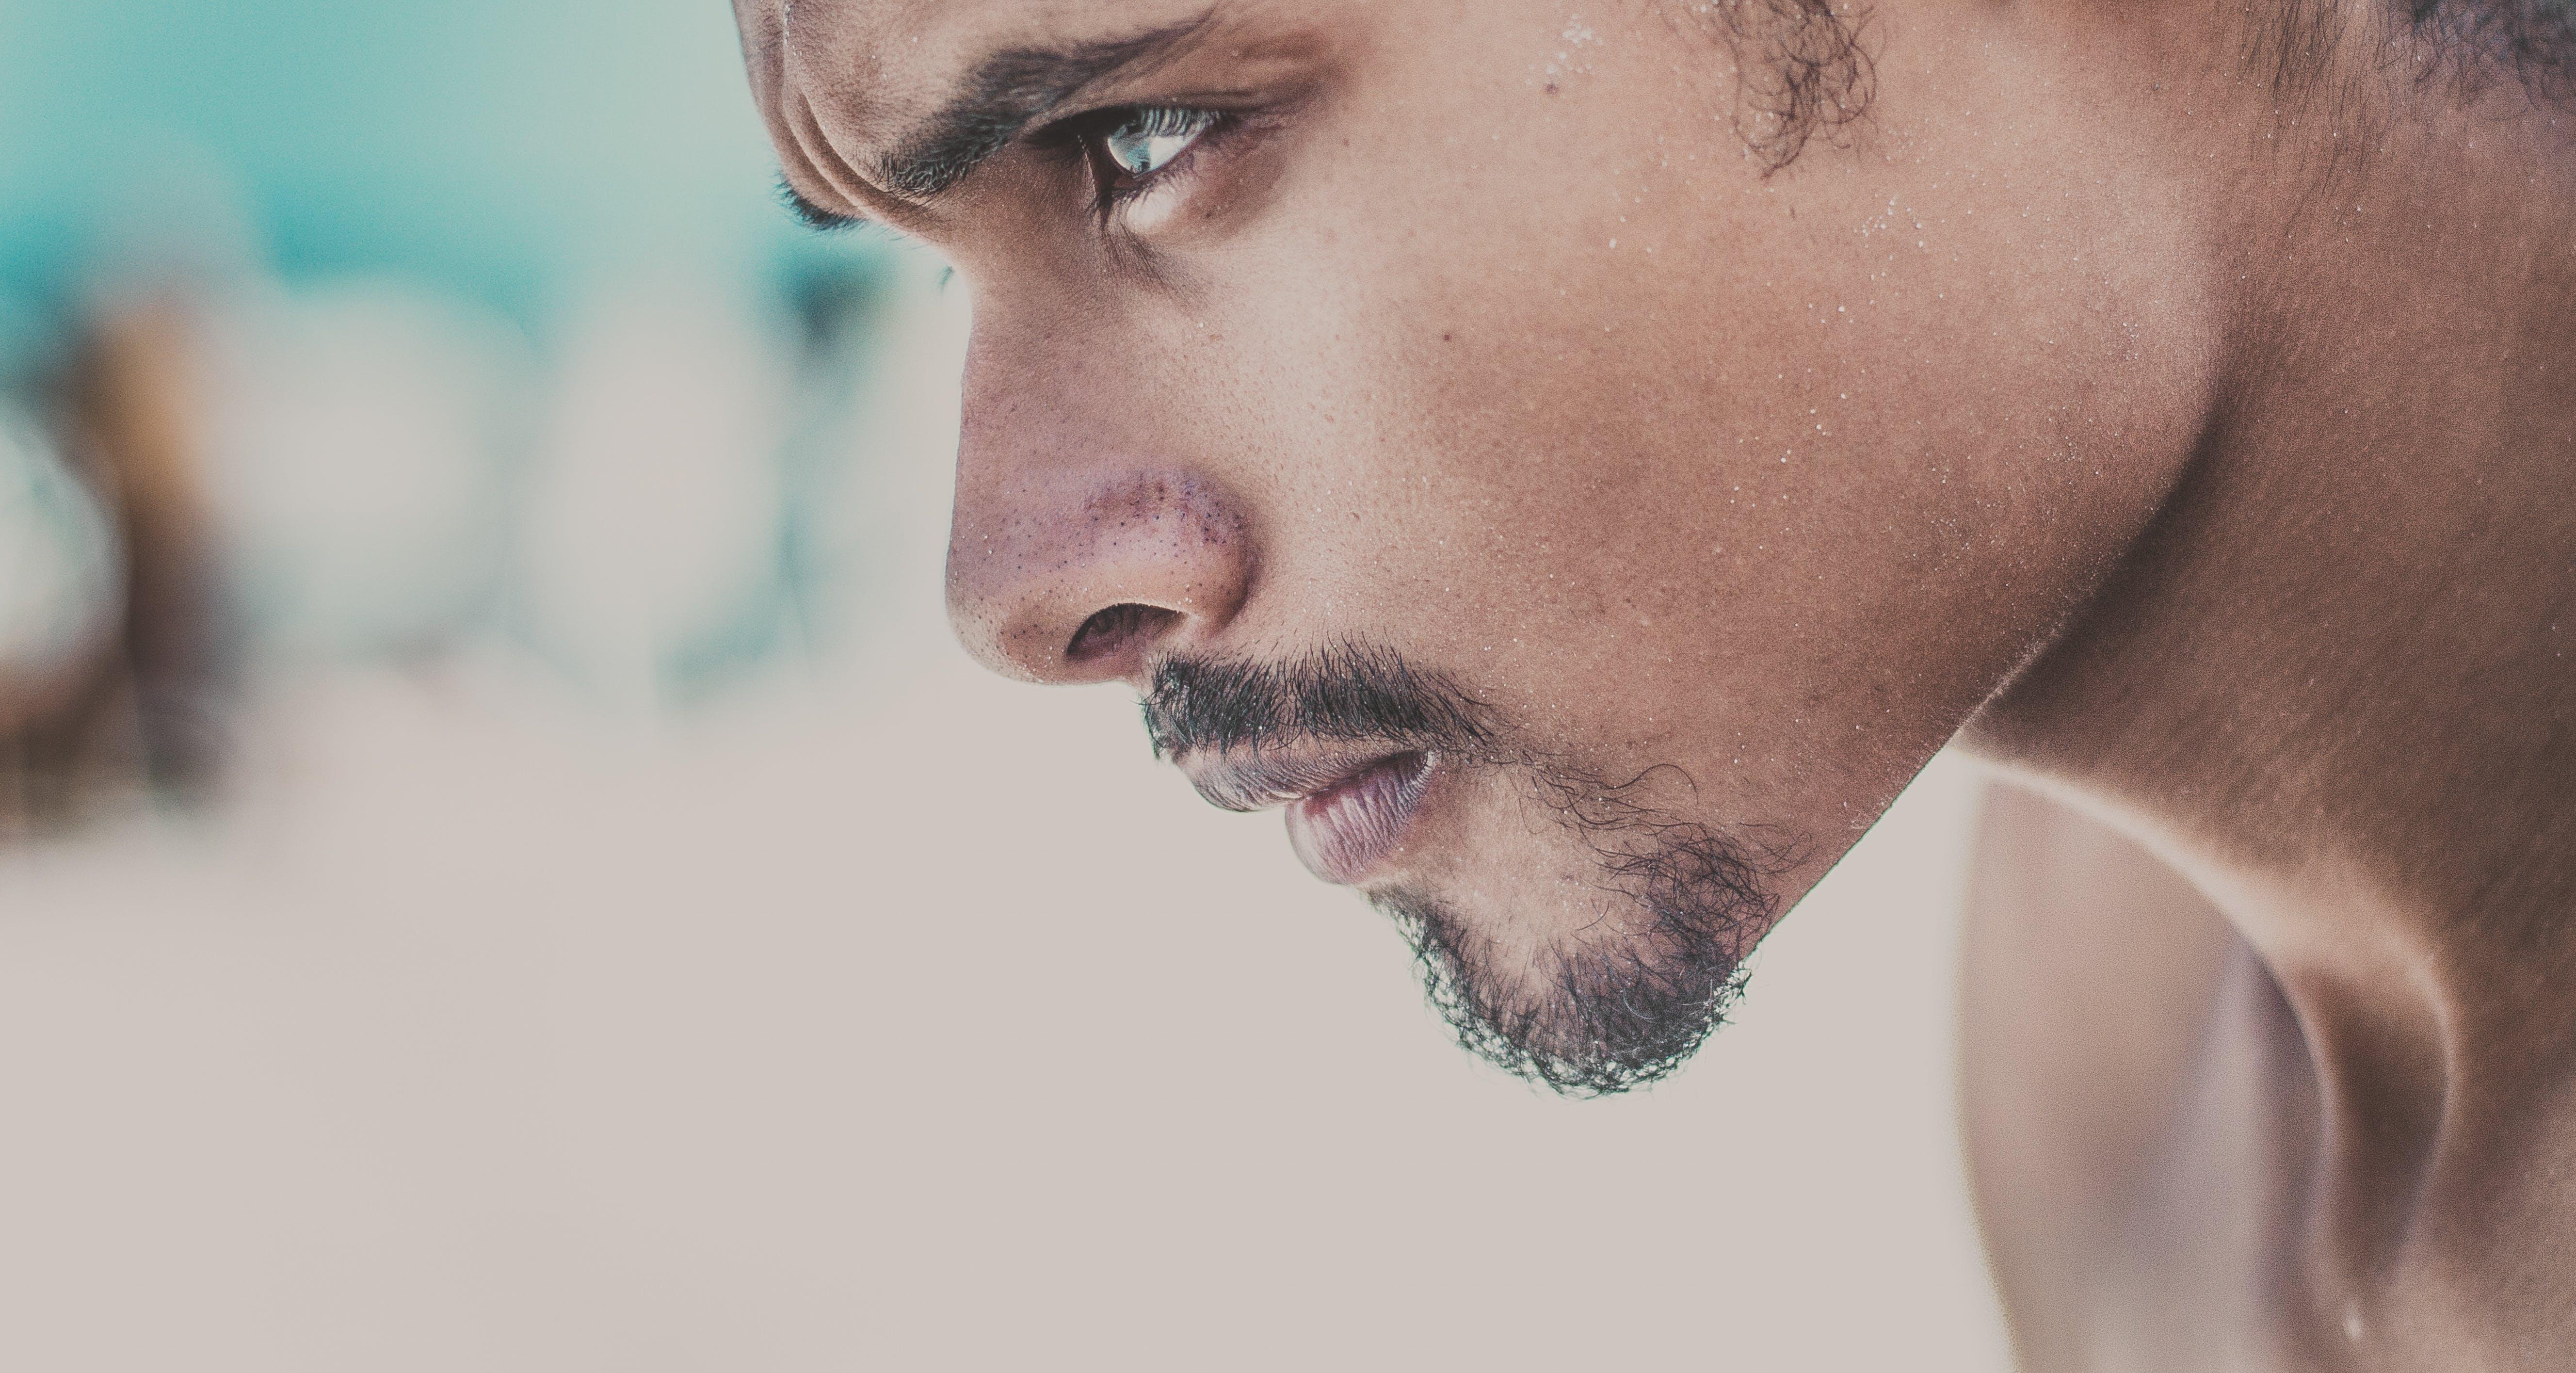 Free stock photo of man, blur, face, beard